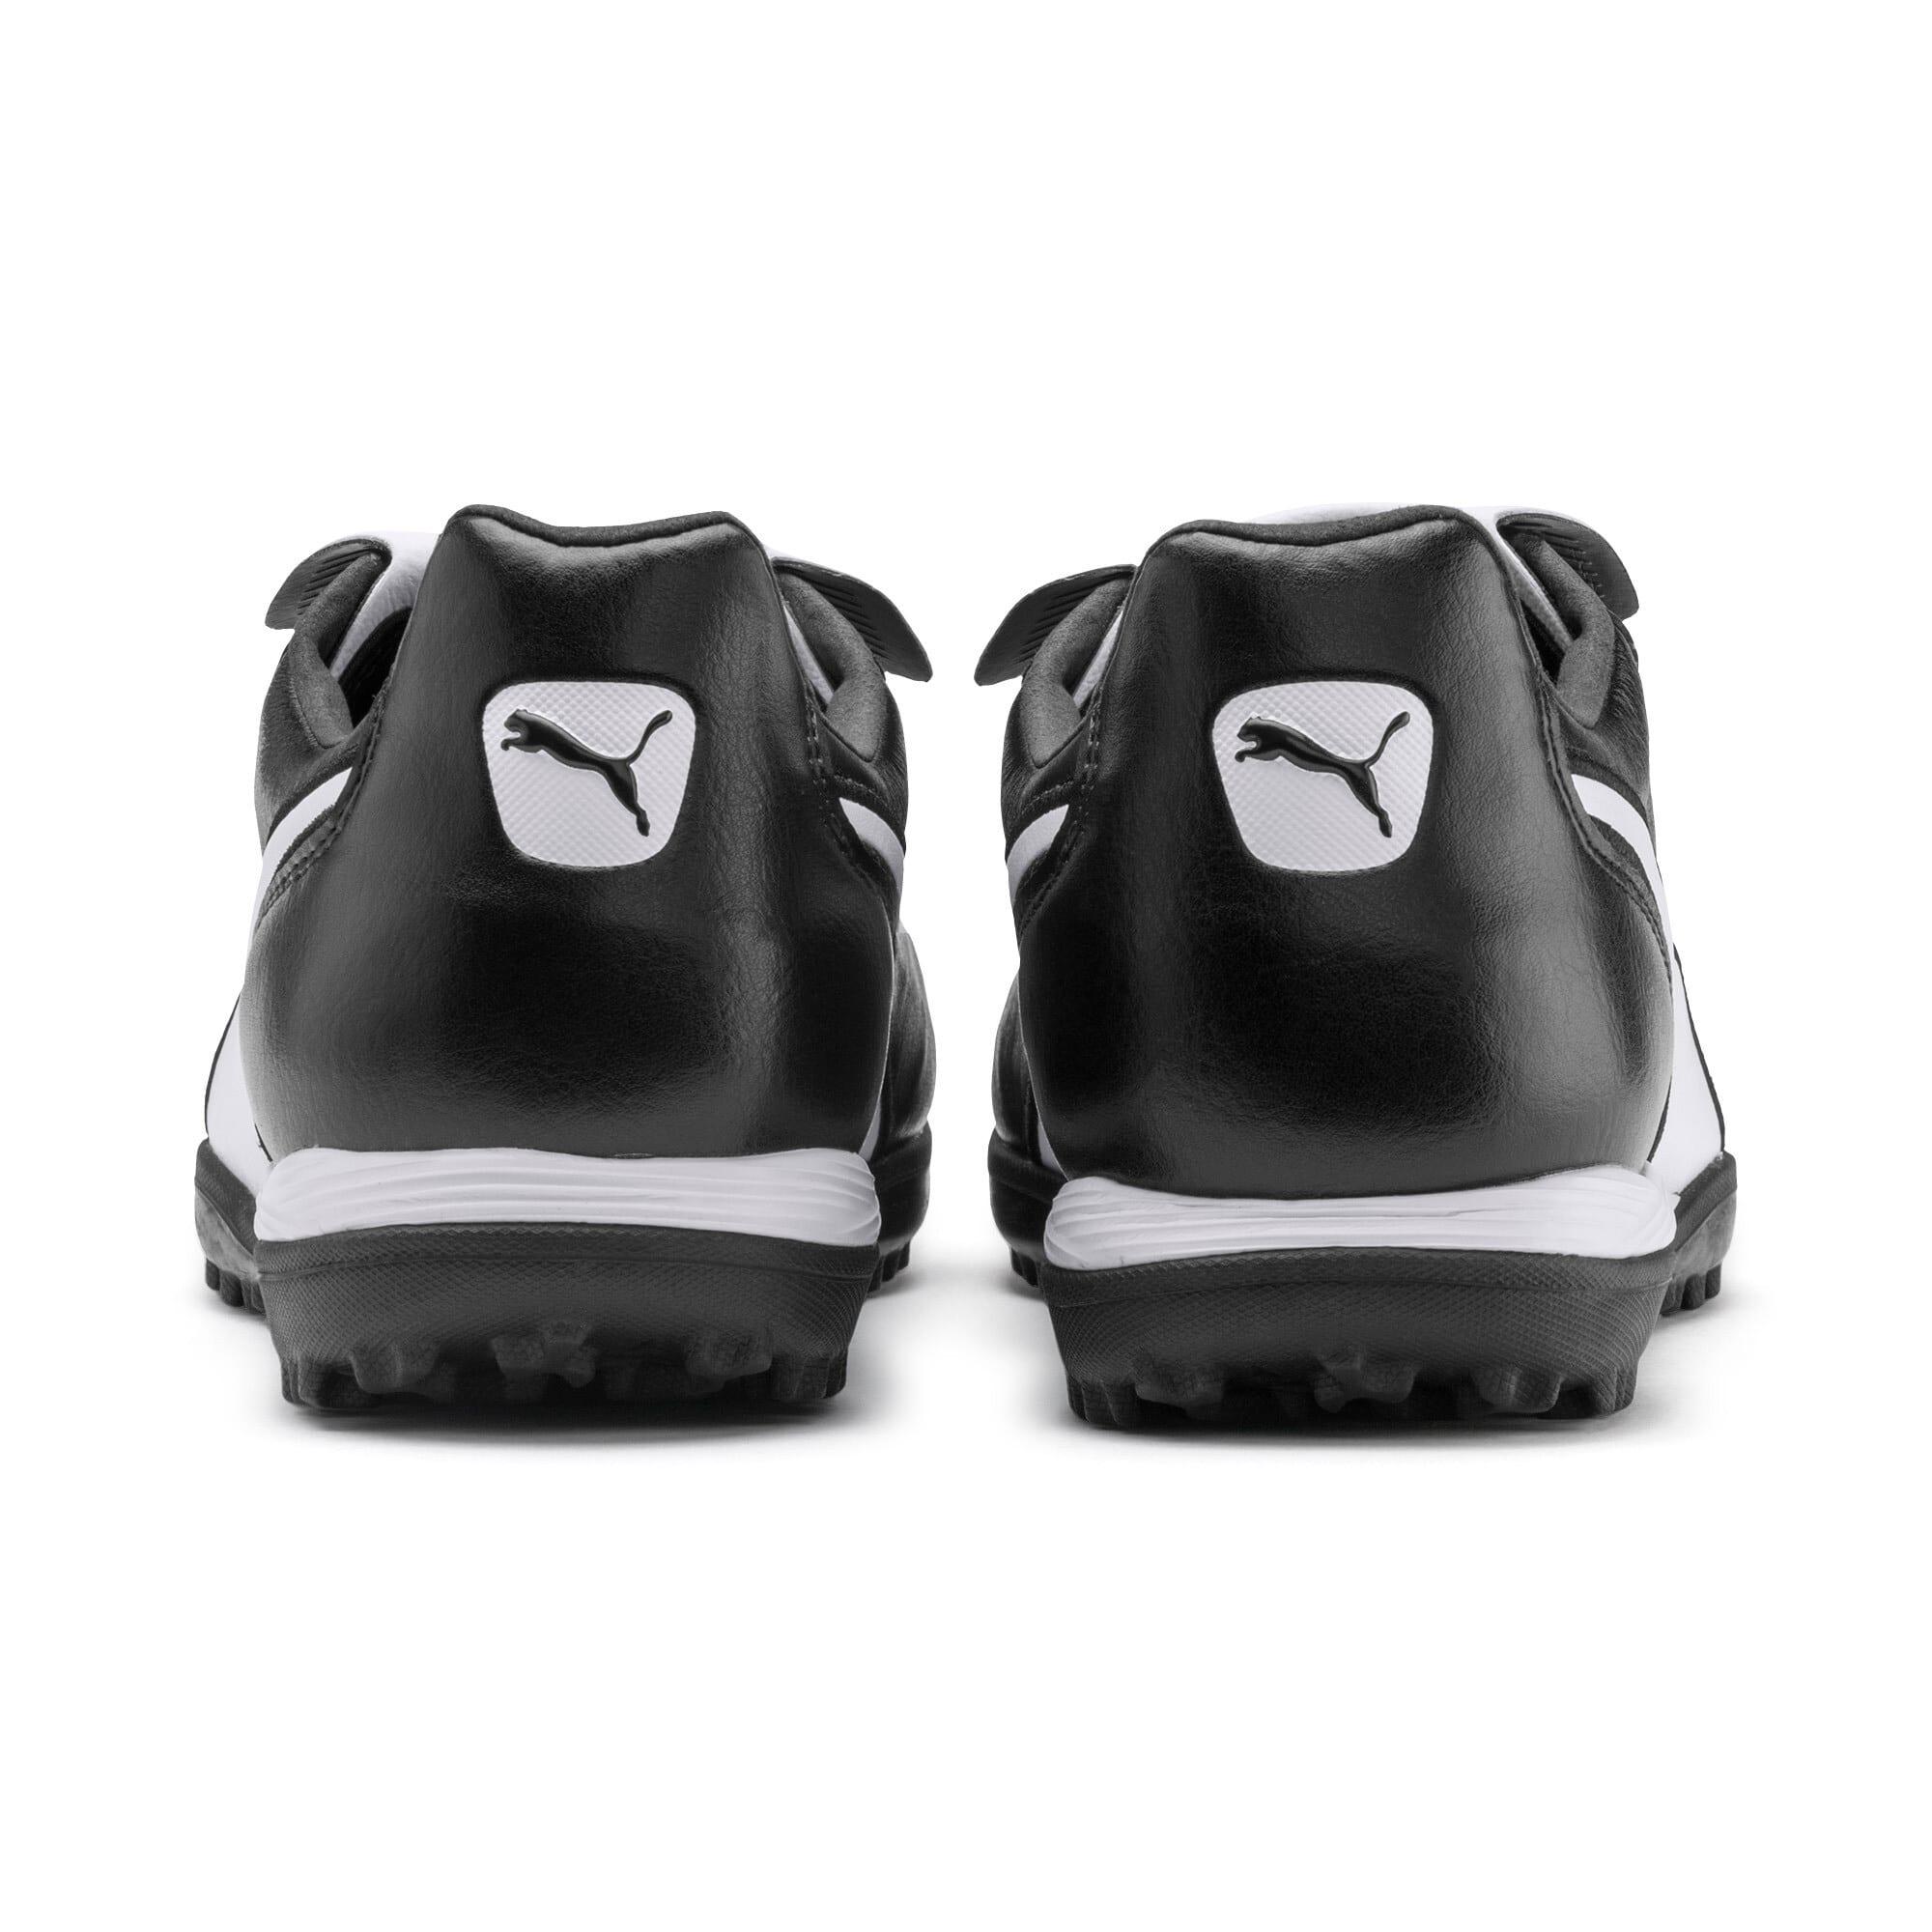 Thumbnail 4 of King Top TT Soccer Shoes, Puma Black-Puma White, medium